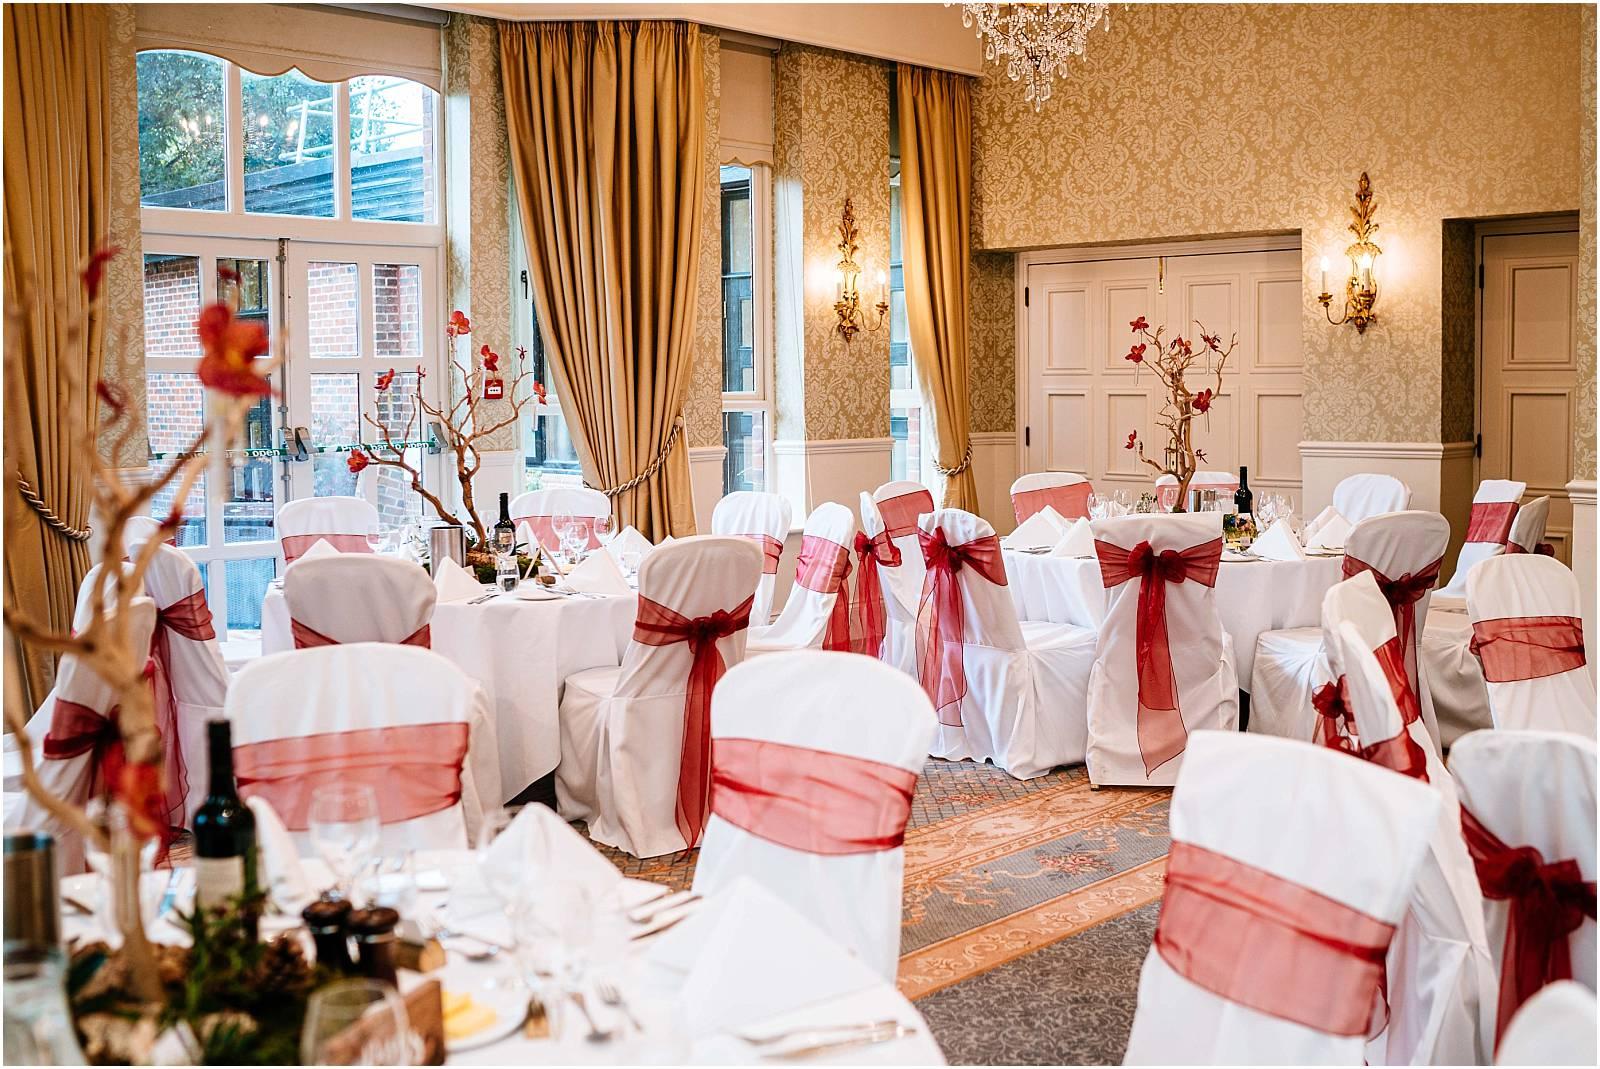 careys manor wedding details set up for wedding breakfast